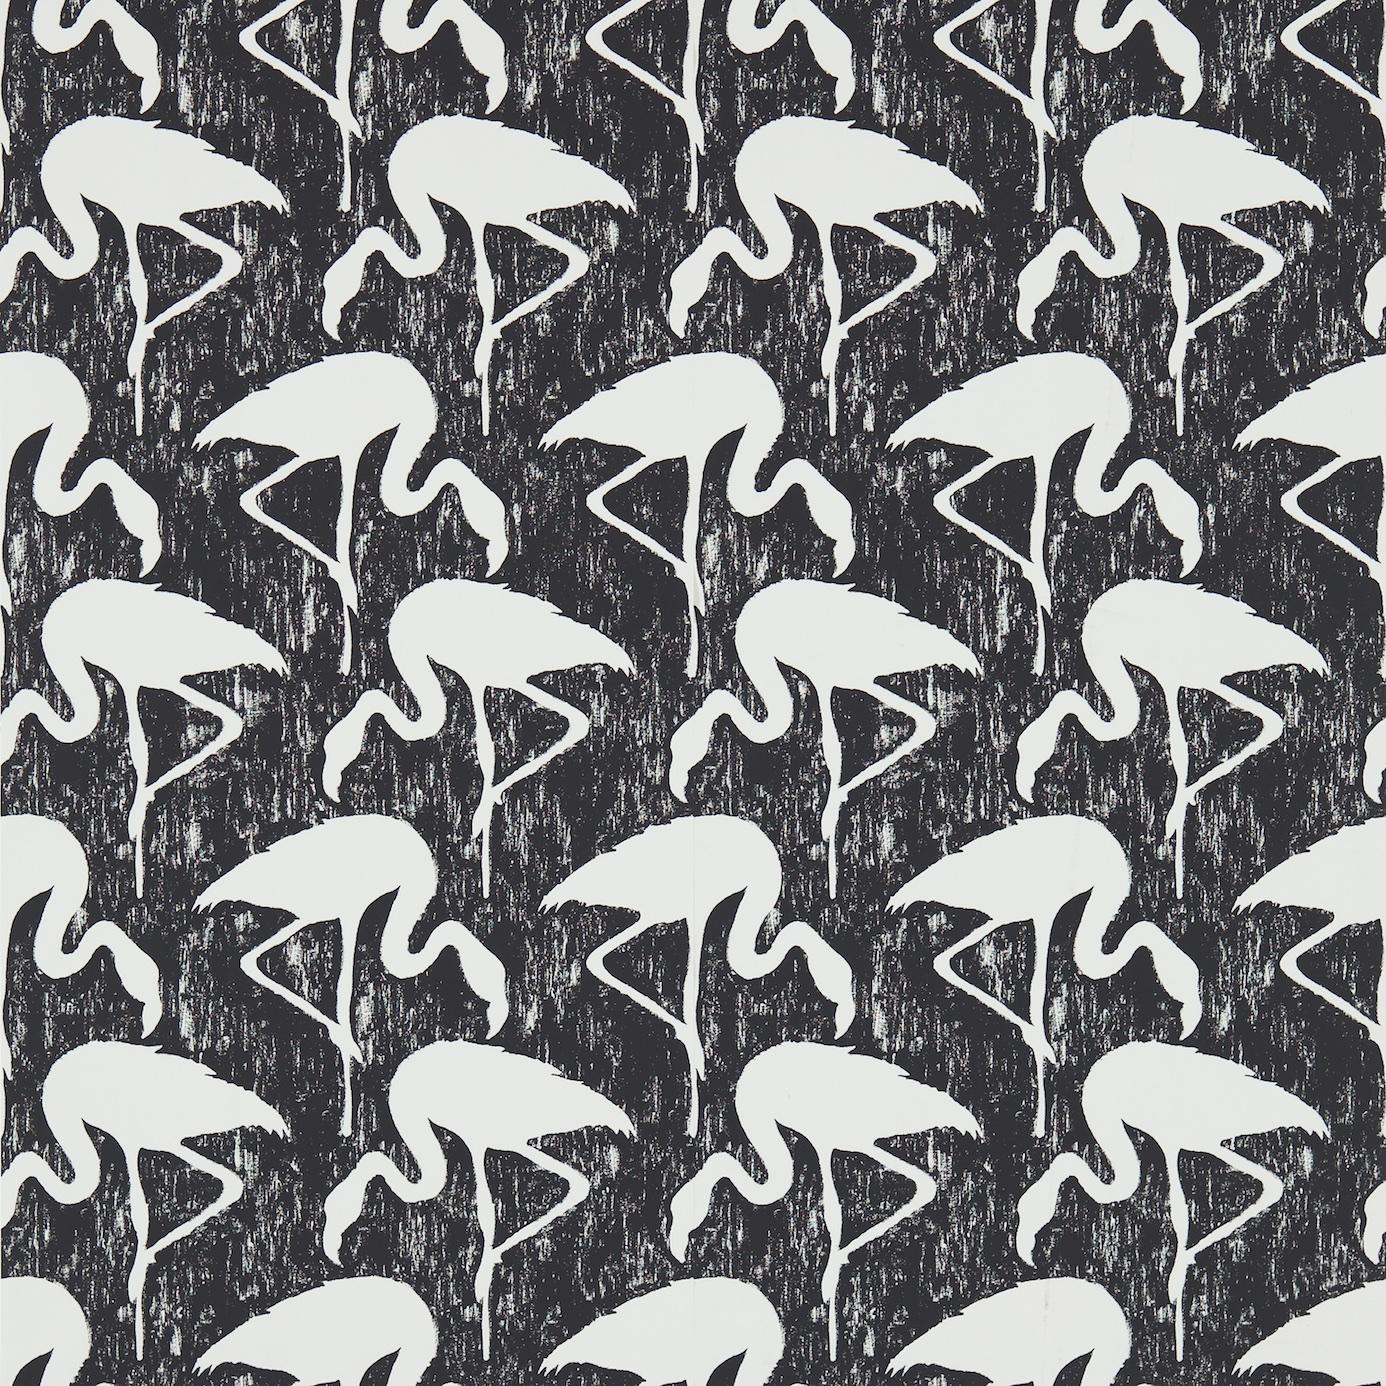 Flamingos-214568